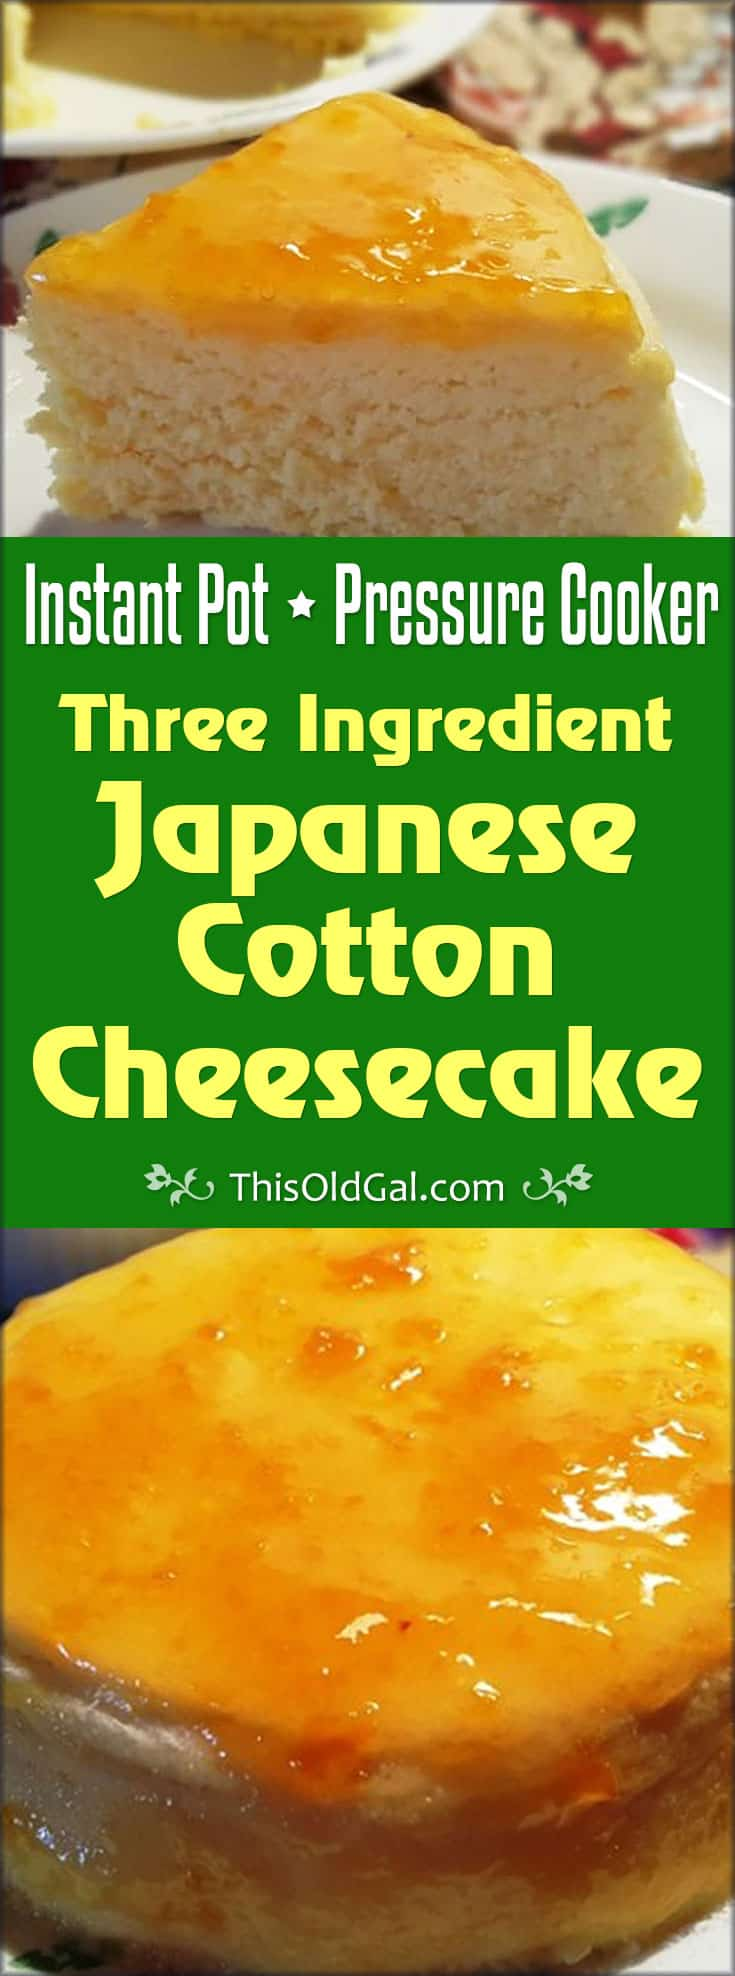 Pressure Cooker Three Ingredient Japanese Cotton Cheesecake